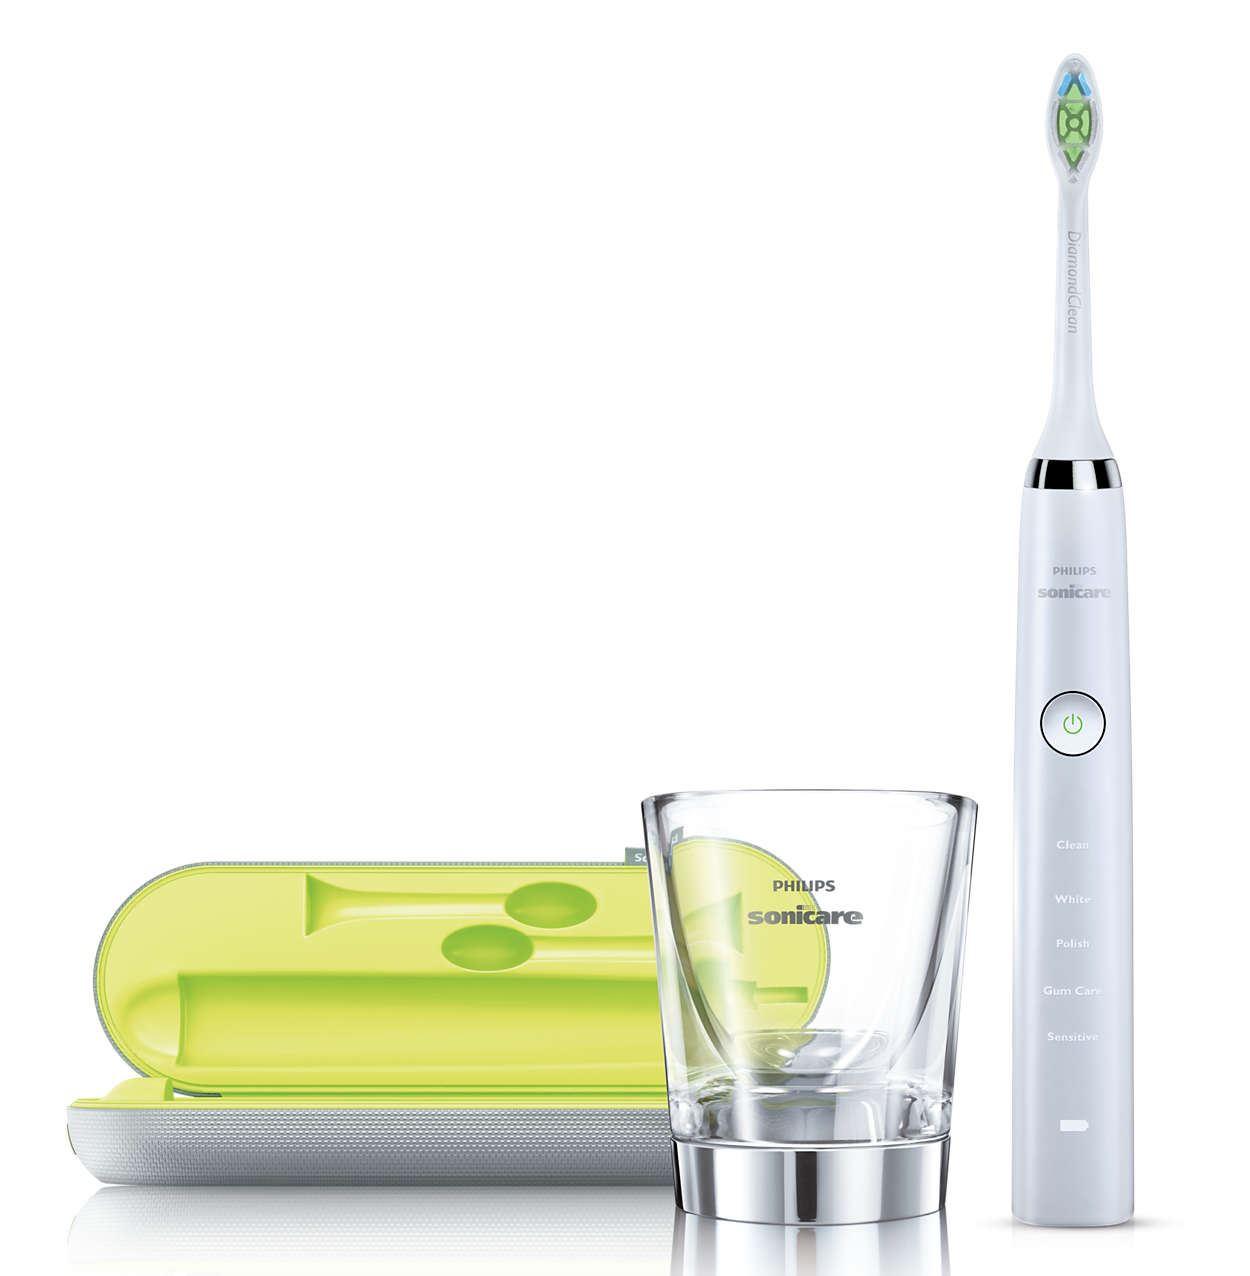 Philips Sonicare DiamondClean Sonic Electric Toothbrush ...